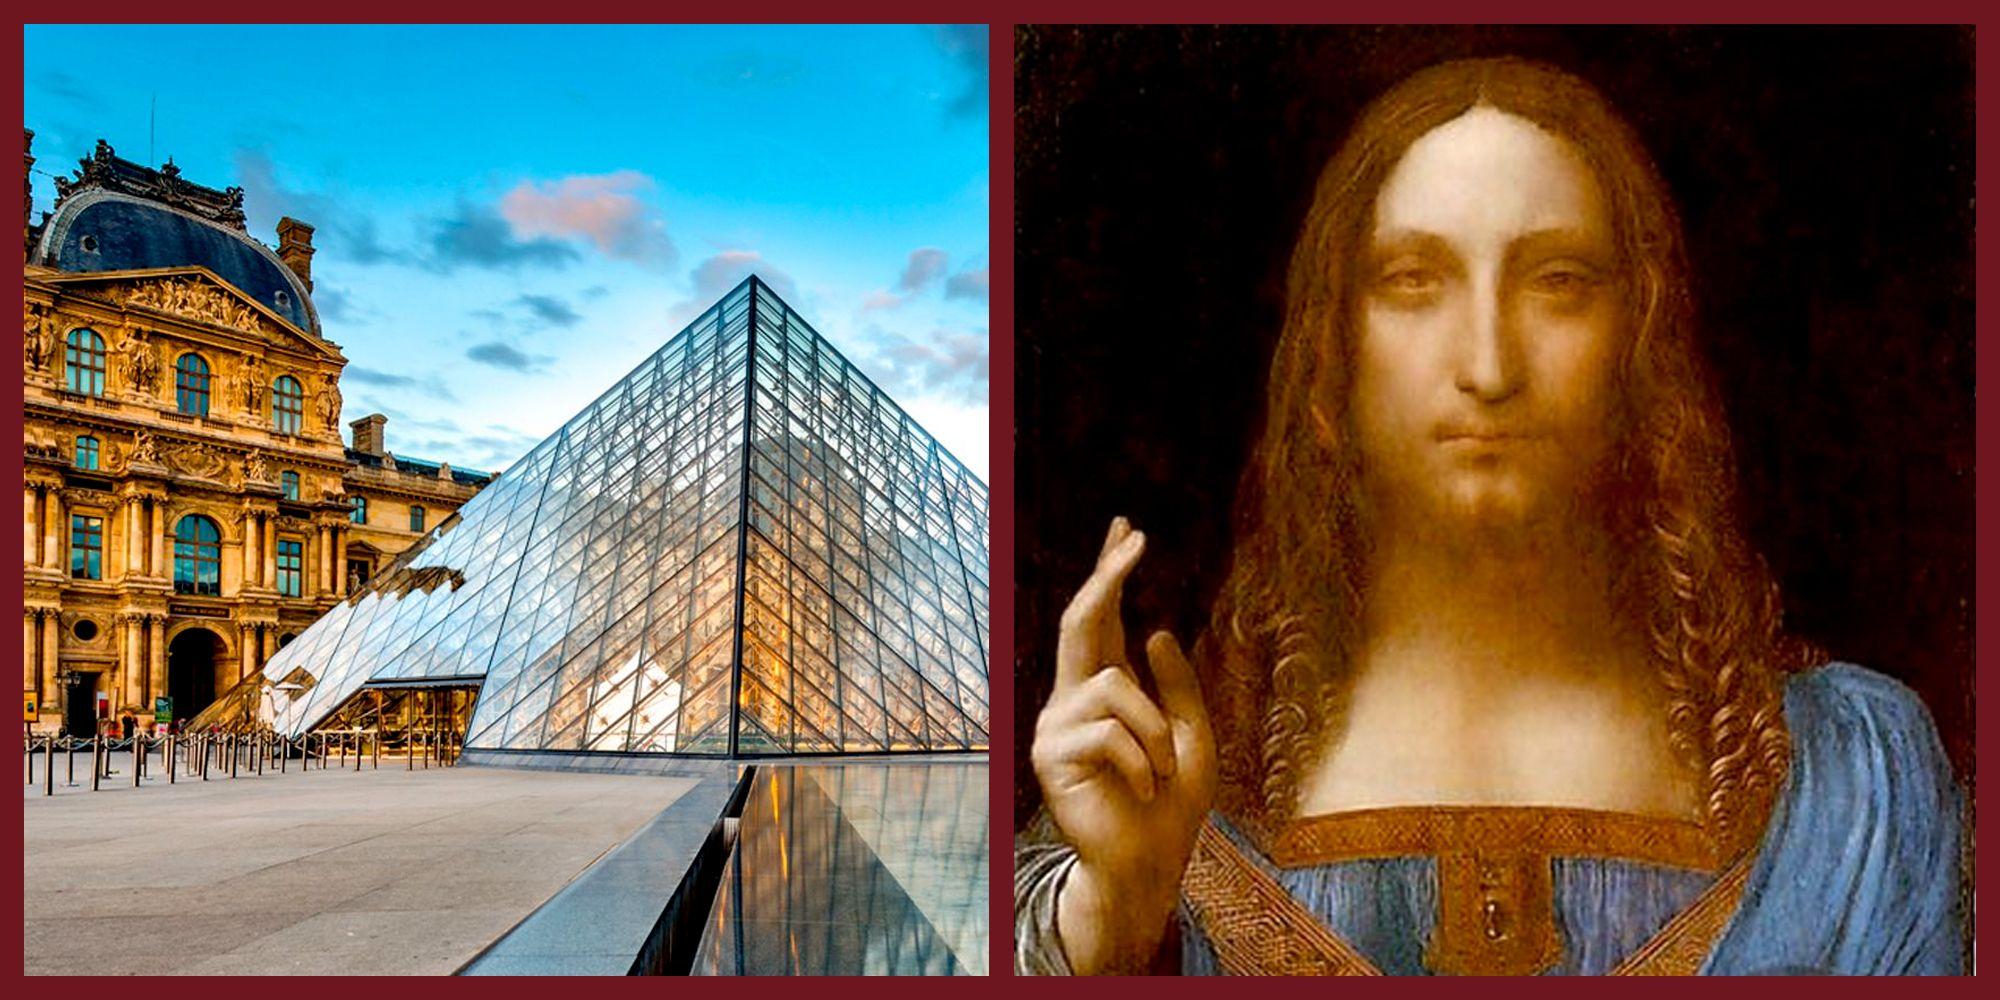 Why the Salvator Mundi Isn't in the Louvre's Blockbuster Leonardo da Vinci Exhibit